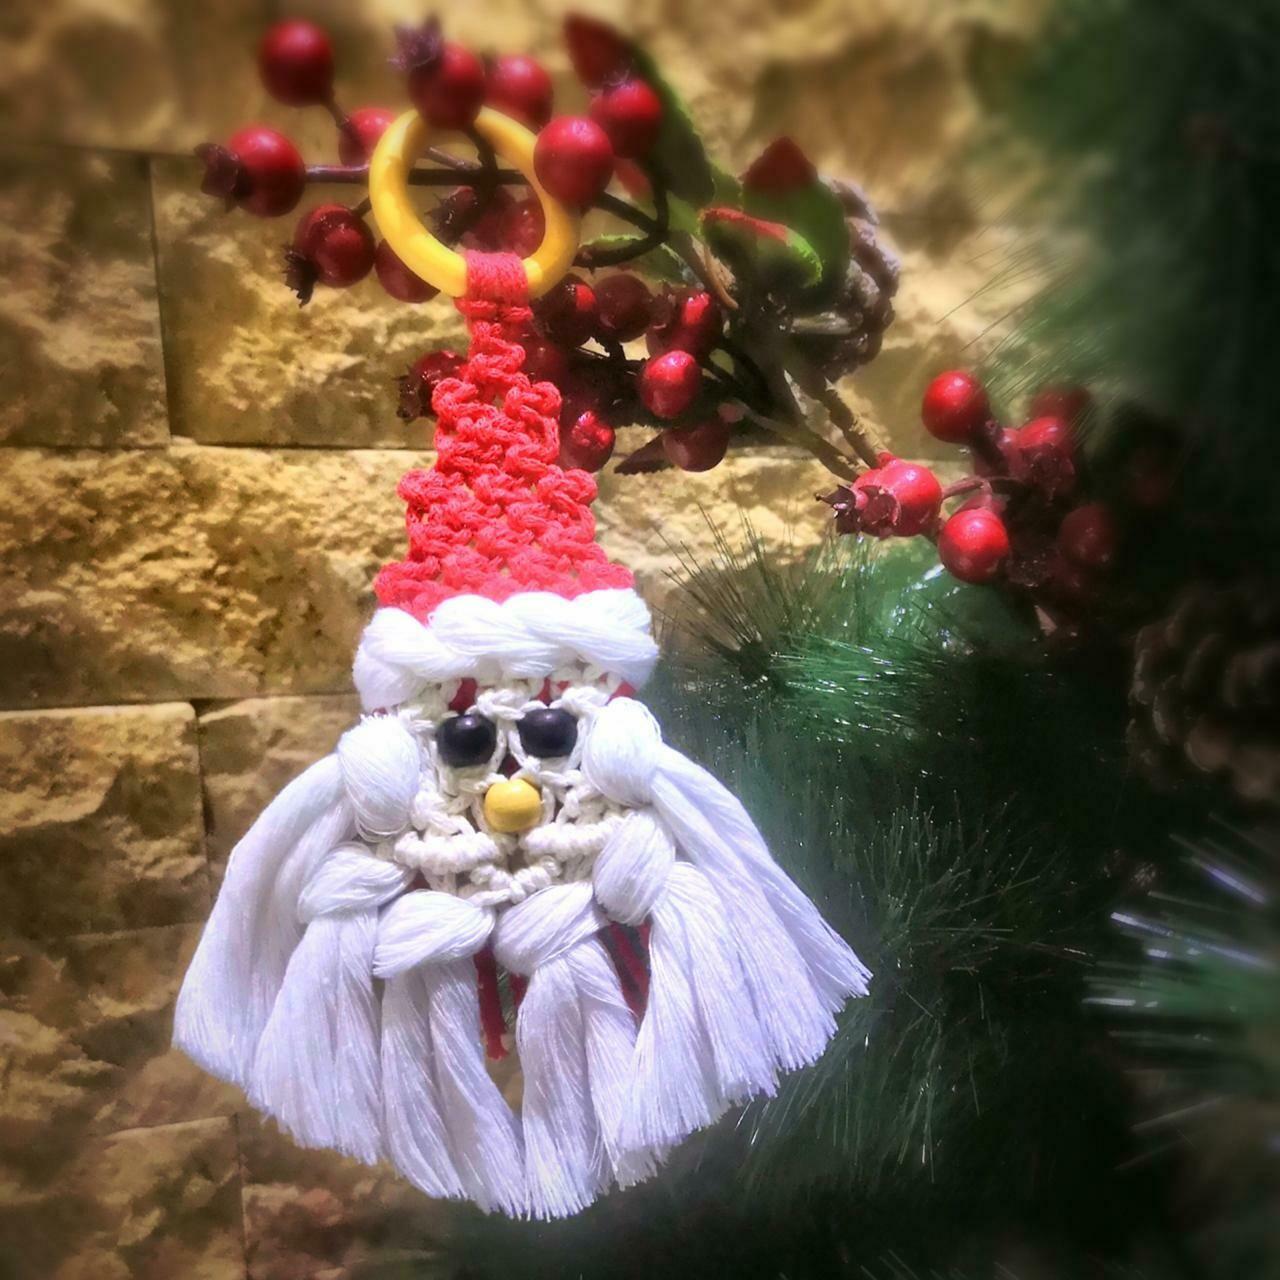 Macramé - Ornament Santa Claus (Piece) - Spot the Knot